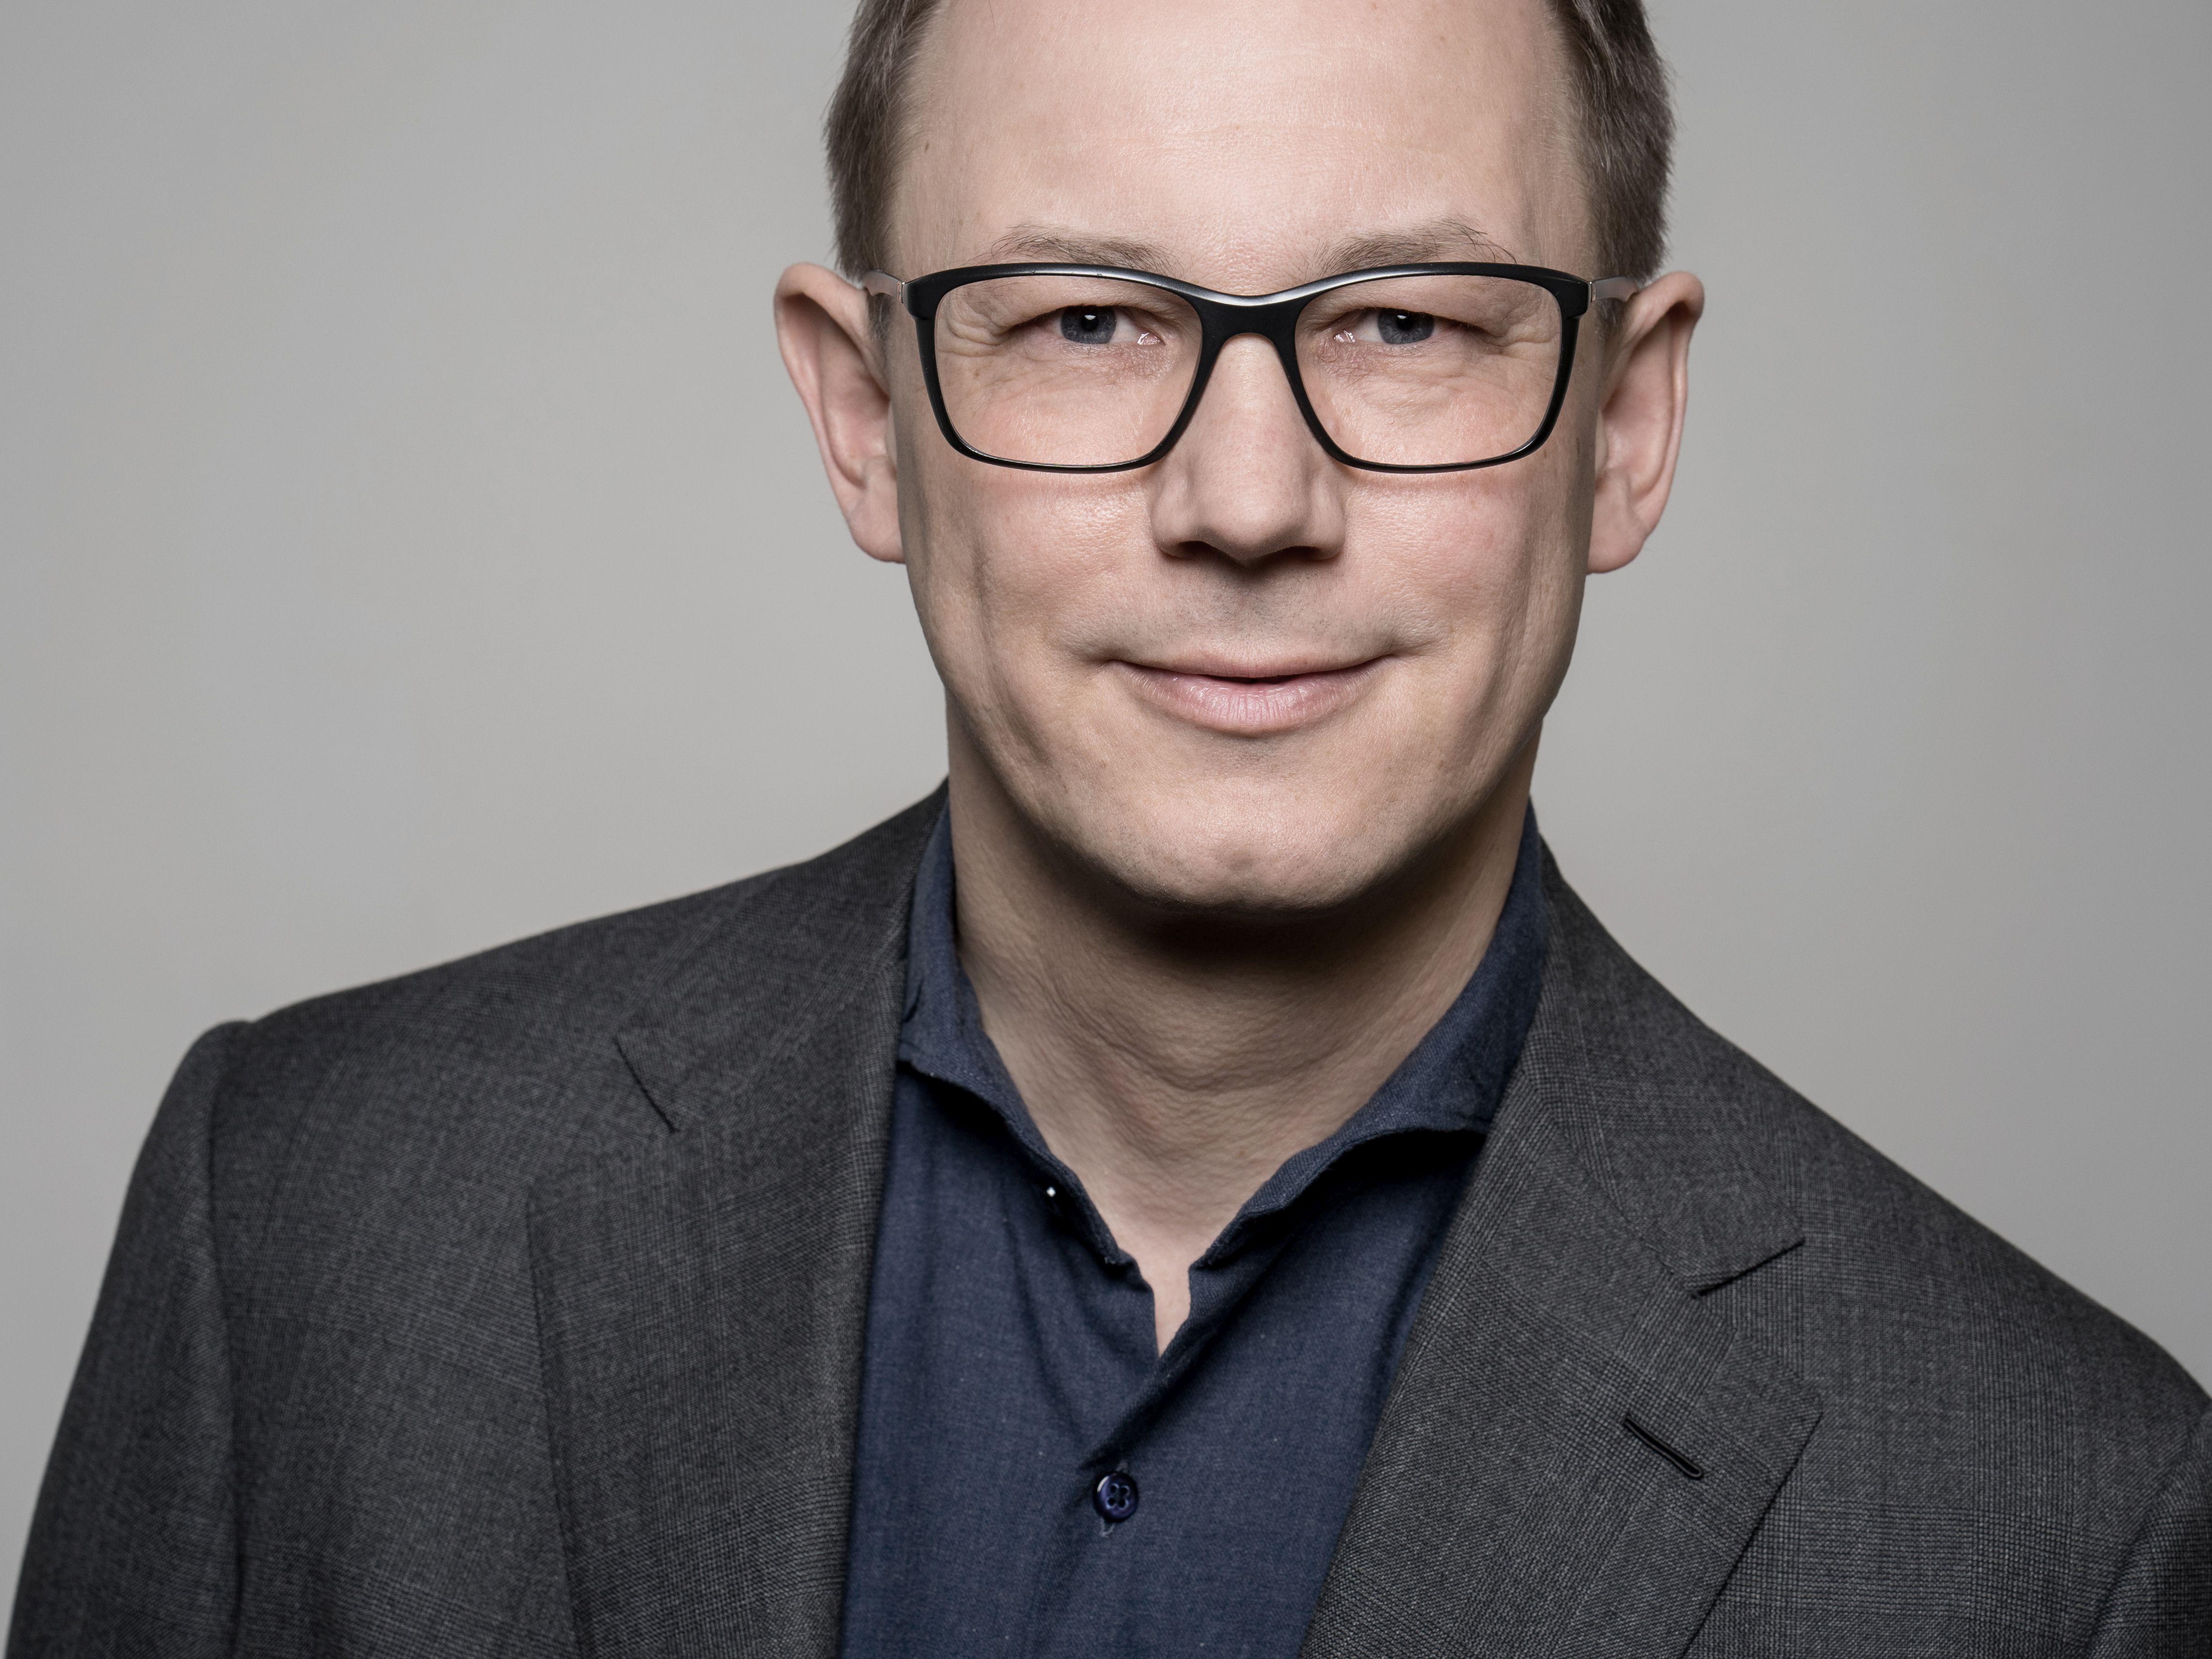 Frank Hülsmann